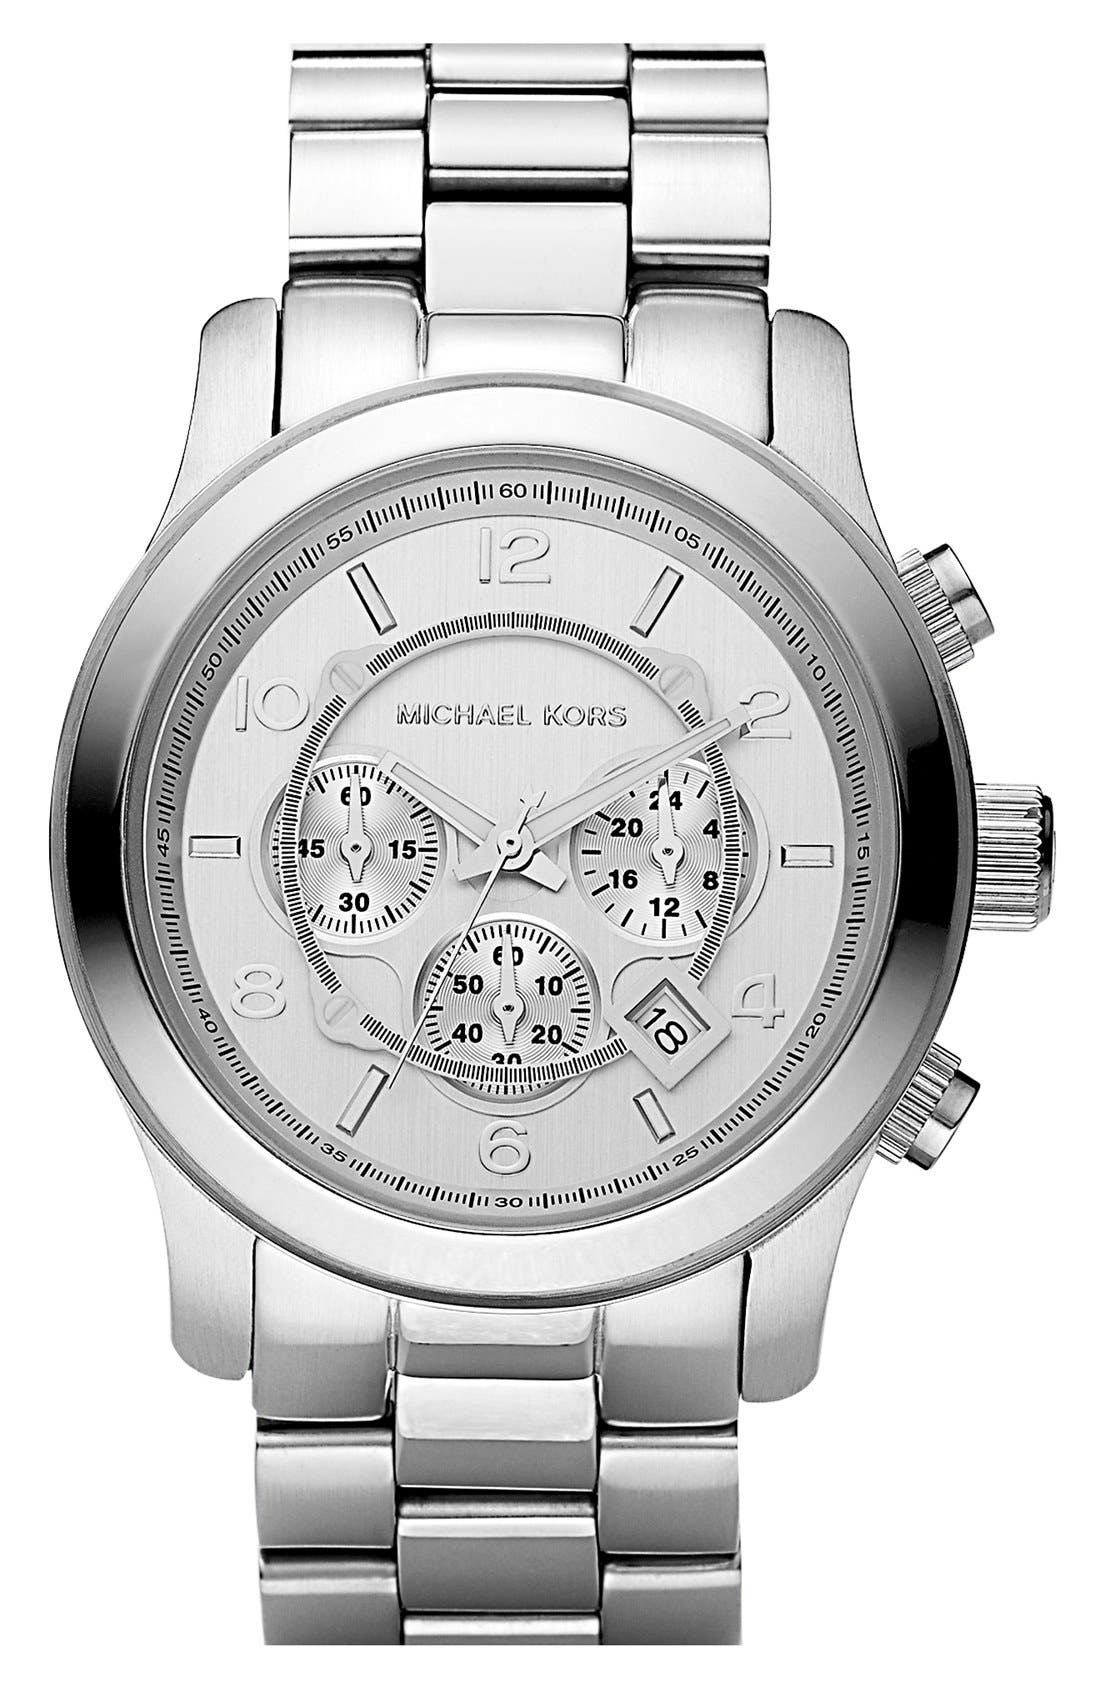 Alternate Image 1 Selected - Michael Kors 'Silvertone Oversize Iconic' Chronograph Watch, 45mm